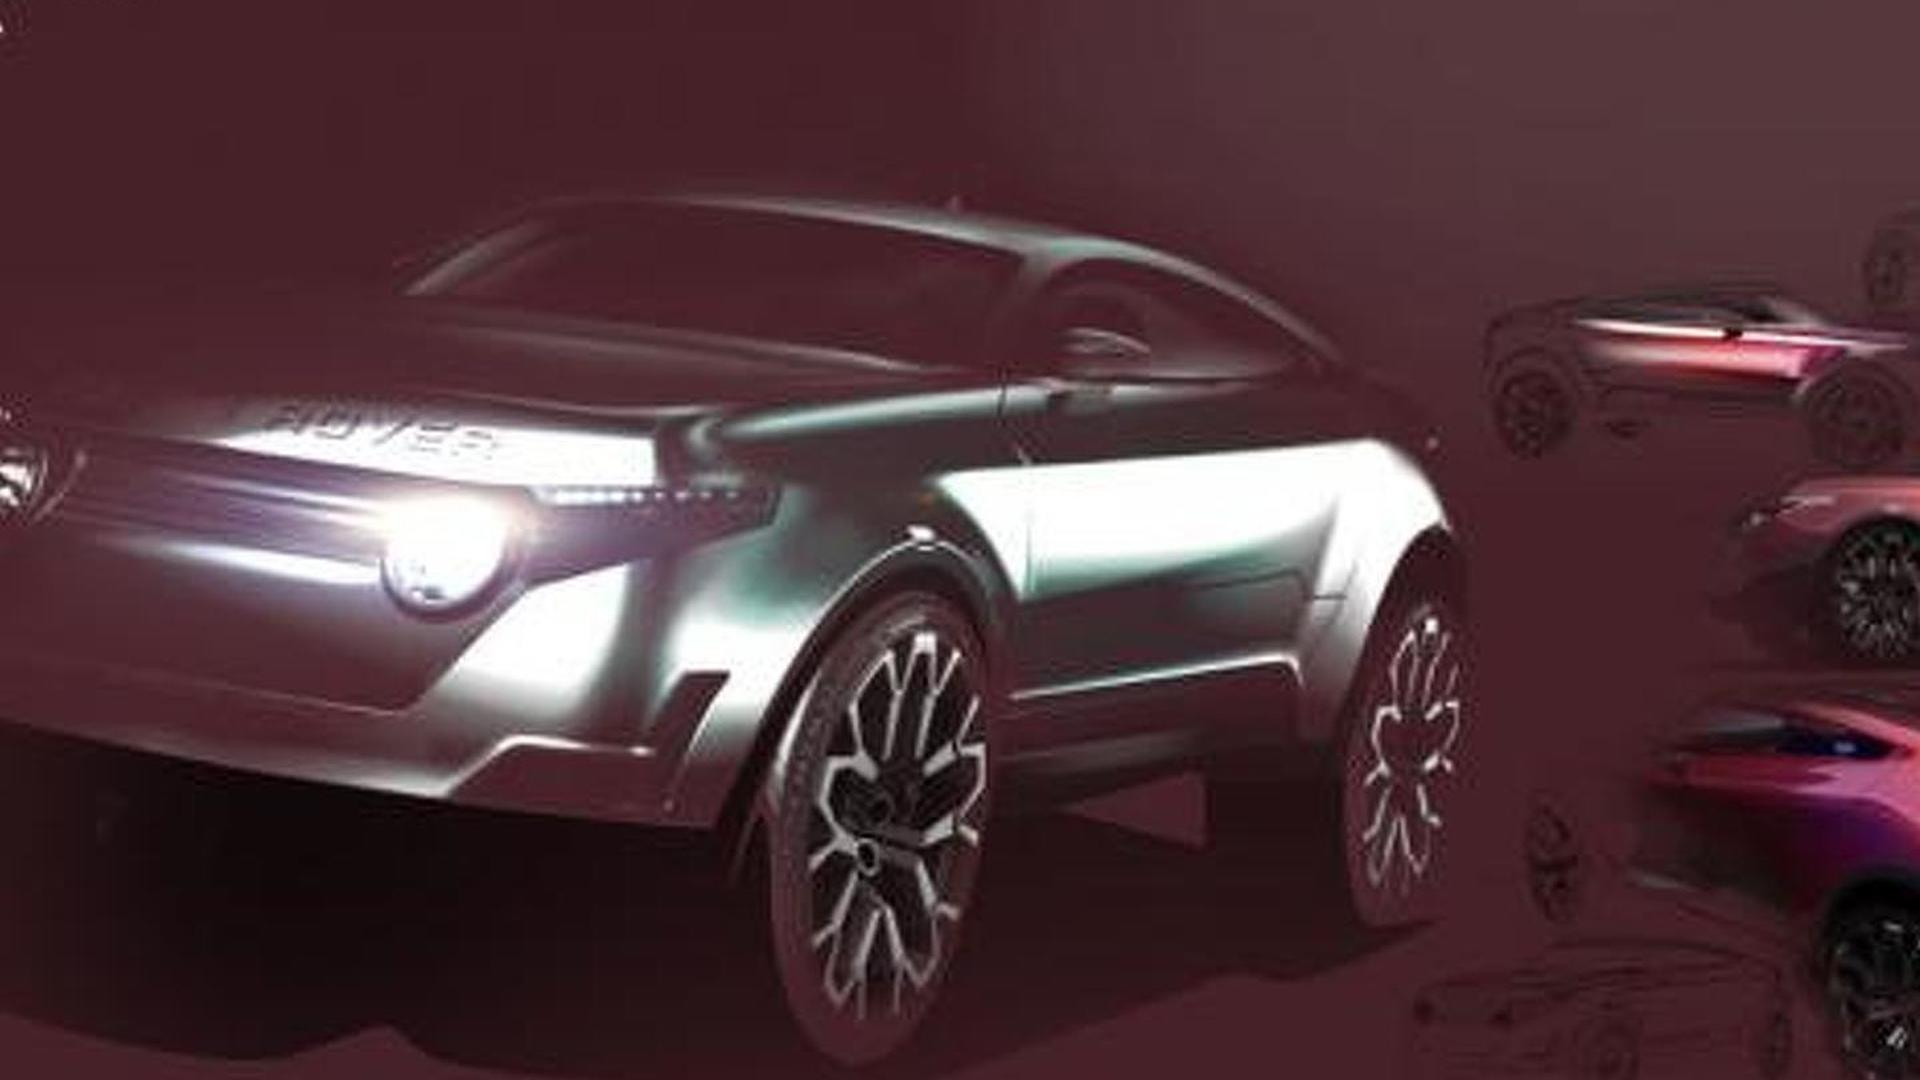 Range Rover LRGT Concept rendered